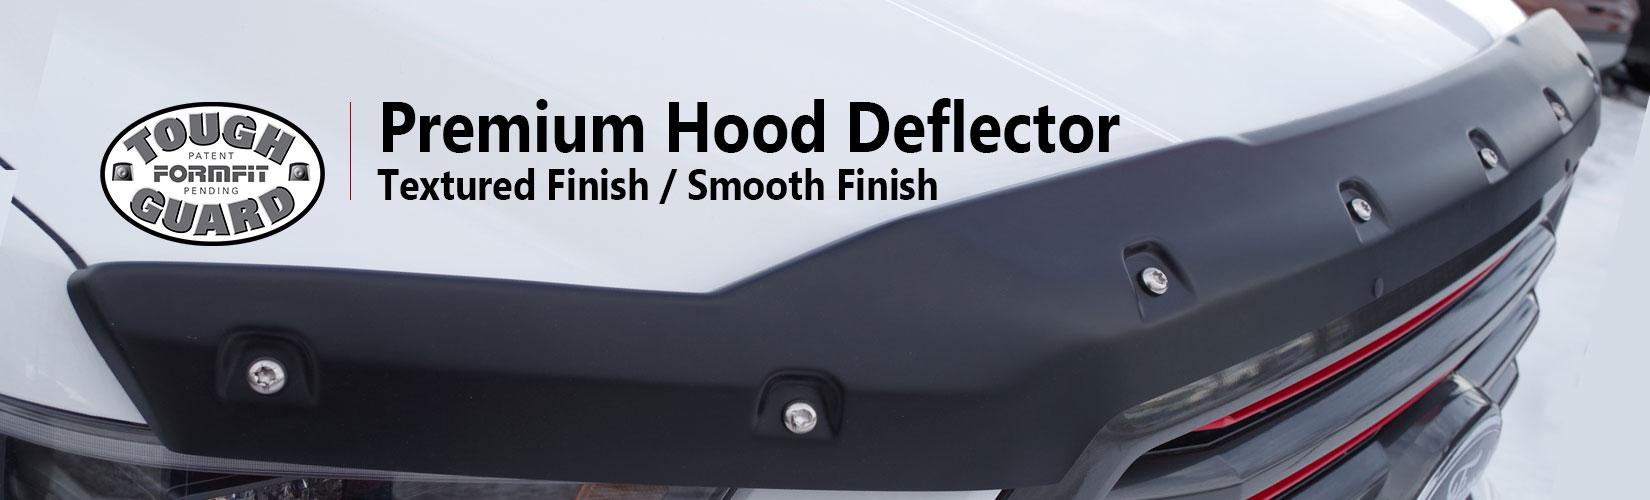 Tough Guard FormFit Smooth Deflector